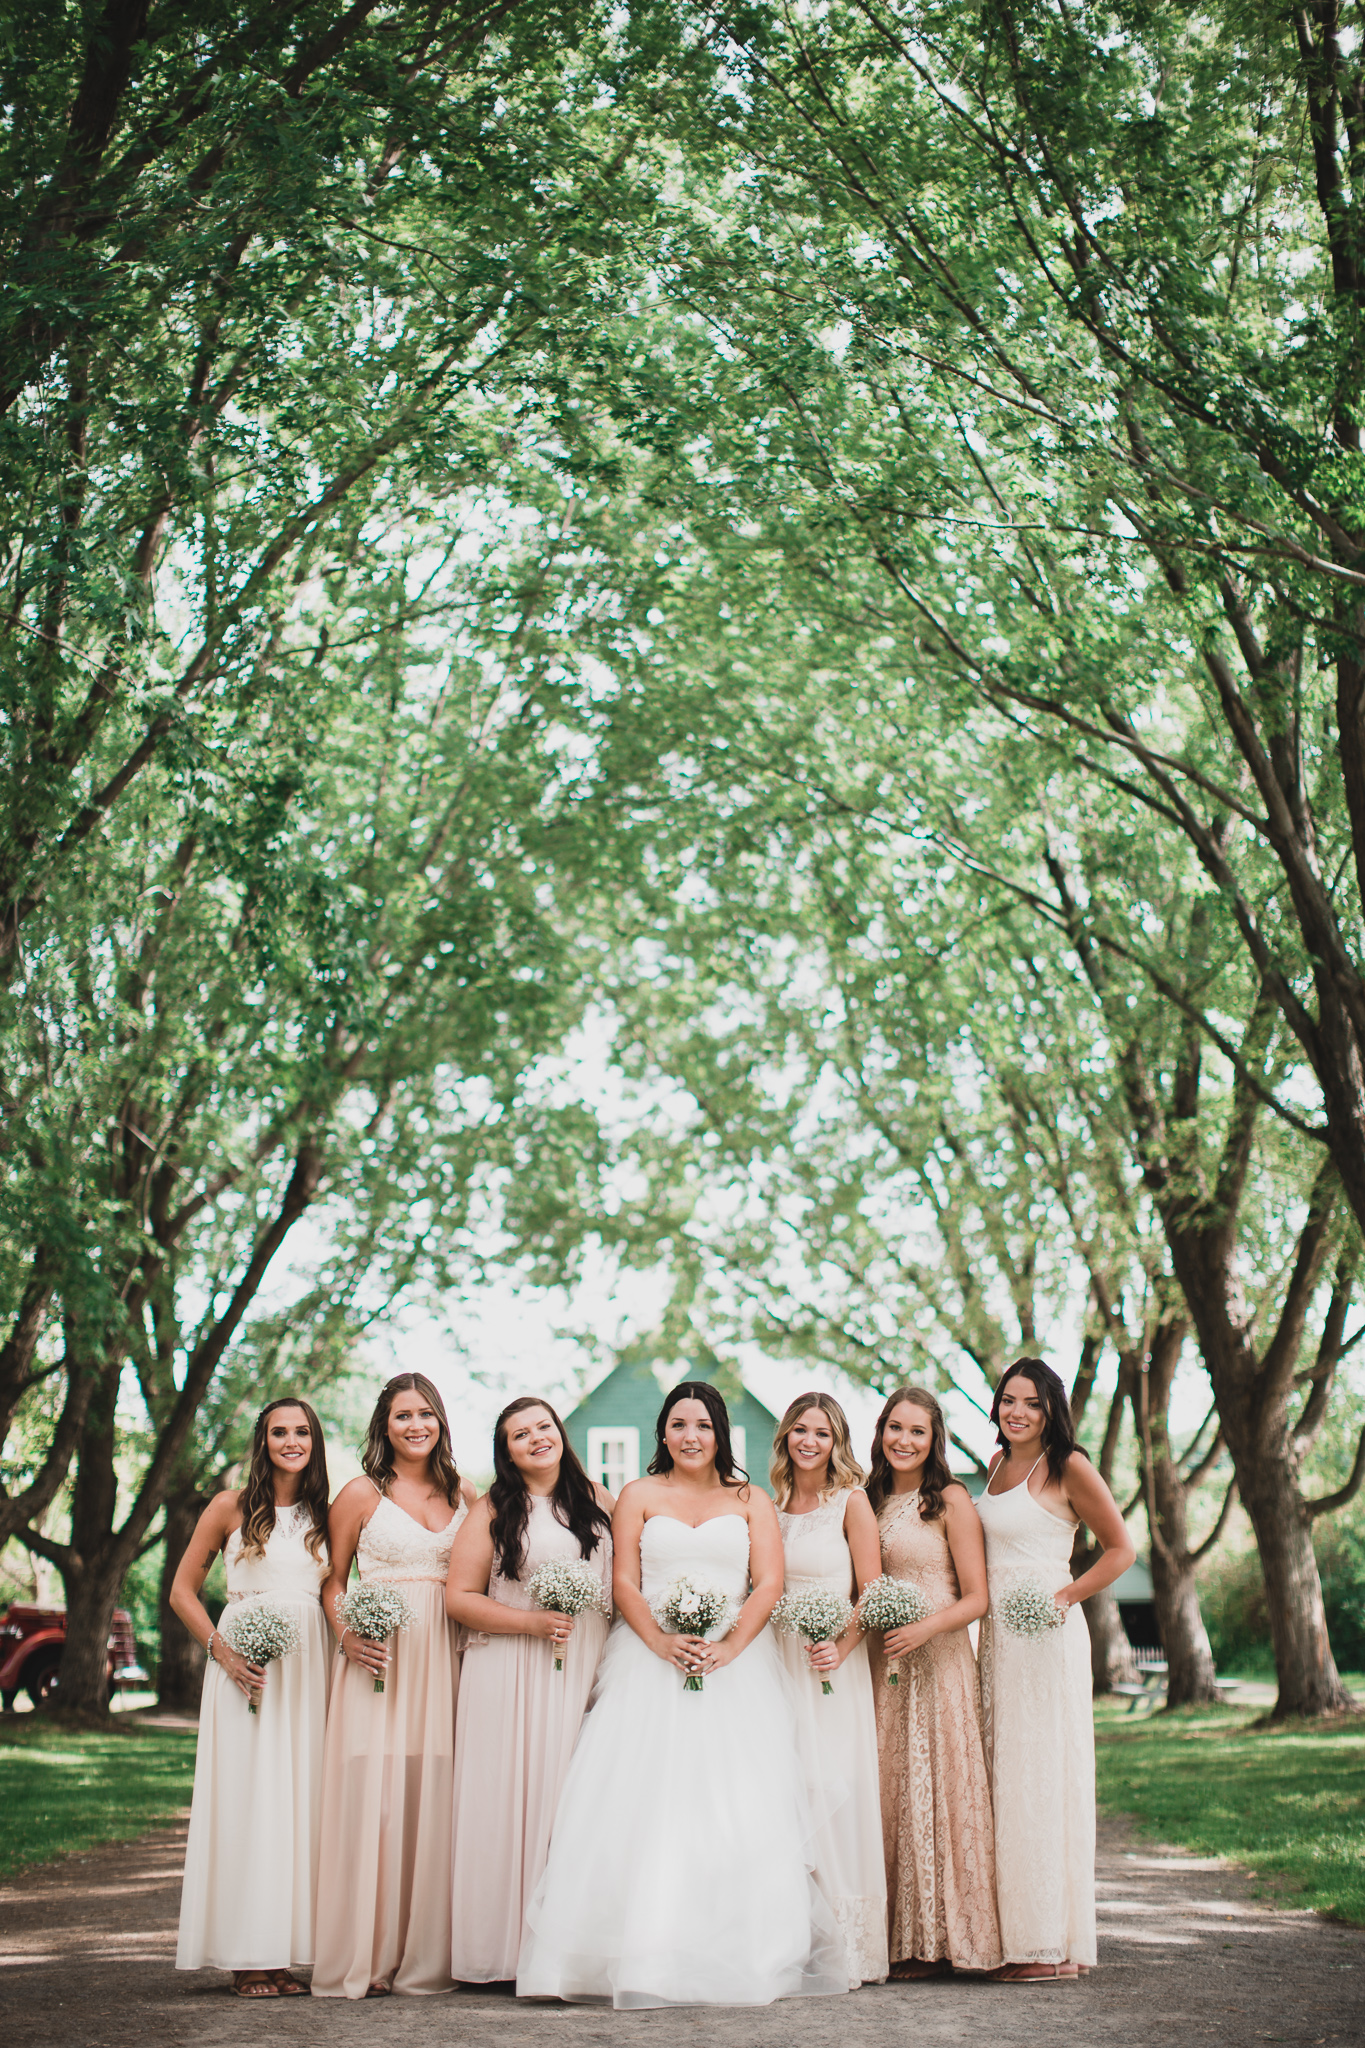 Ottawa wedding photo locations